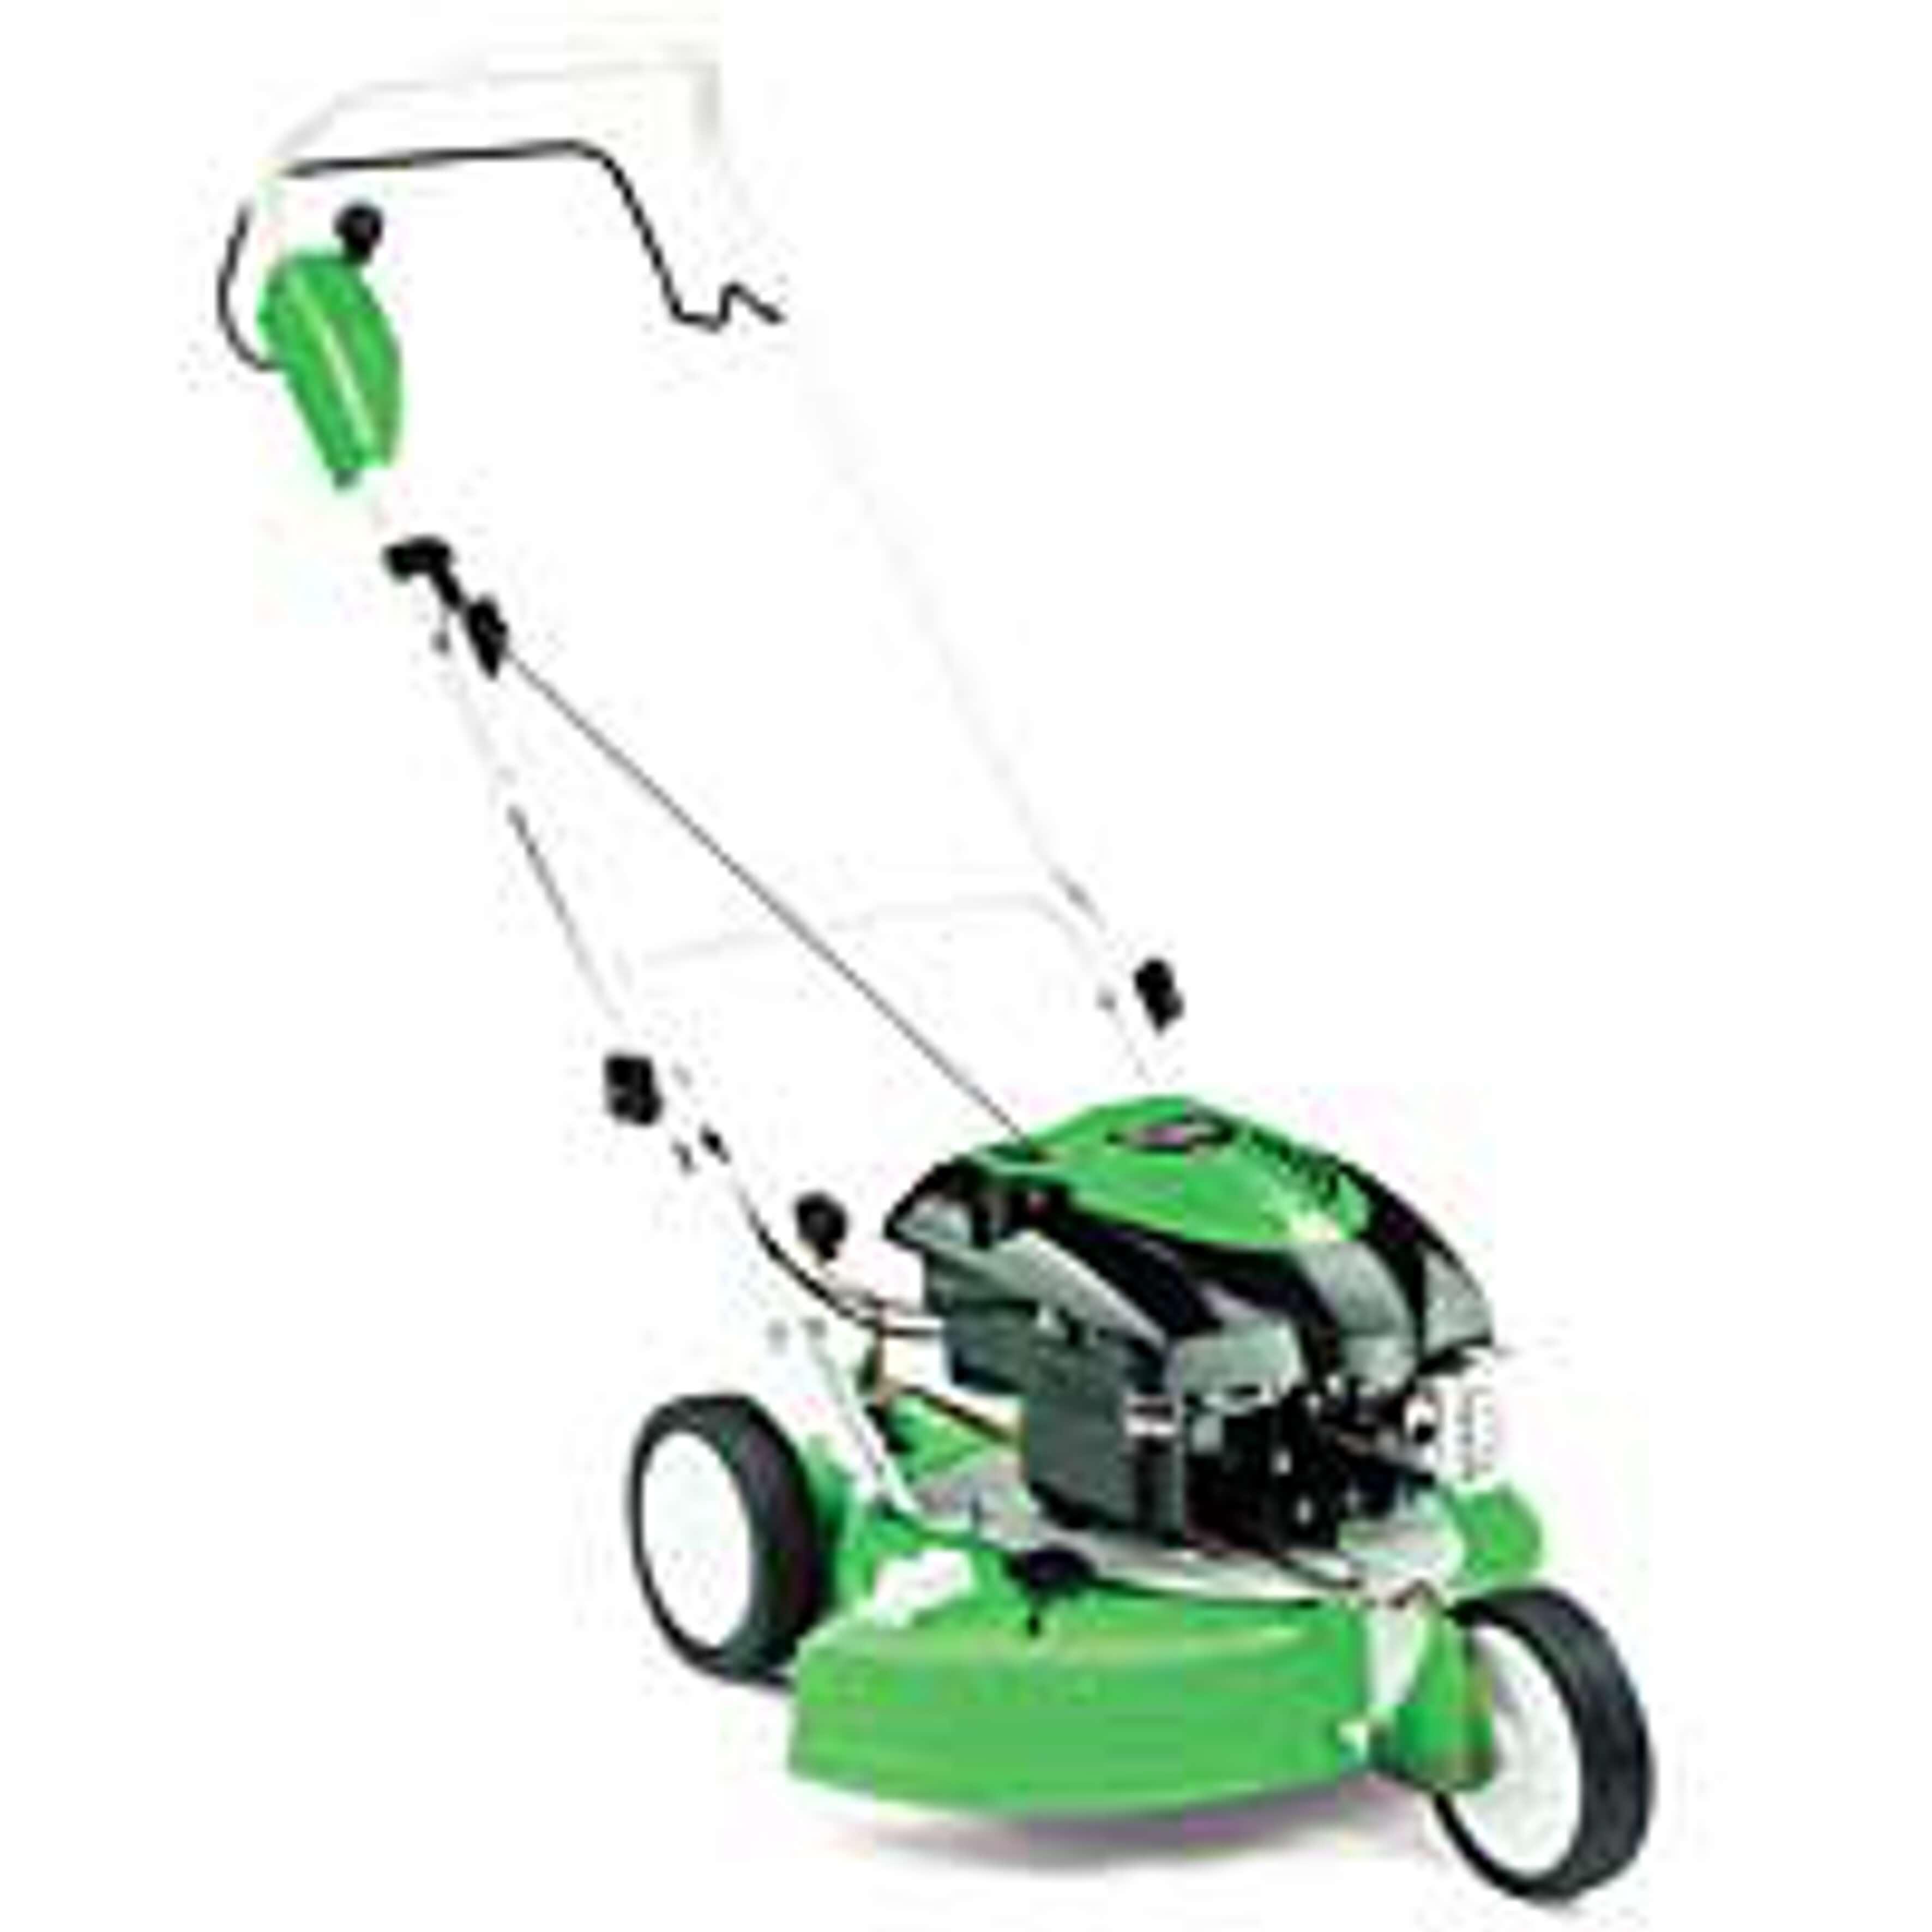 Viking MB 3 R Petrol Lawn Mowers